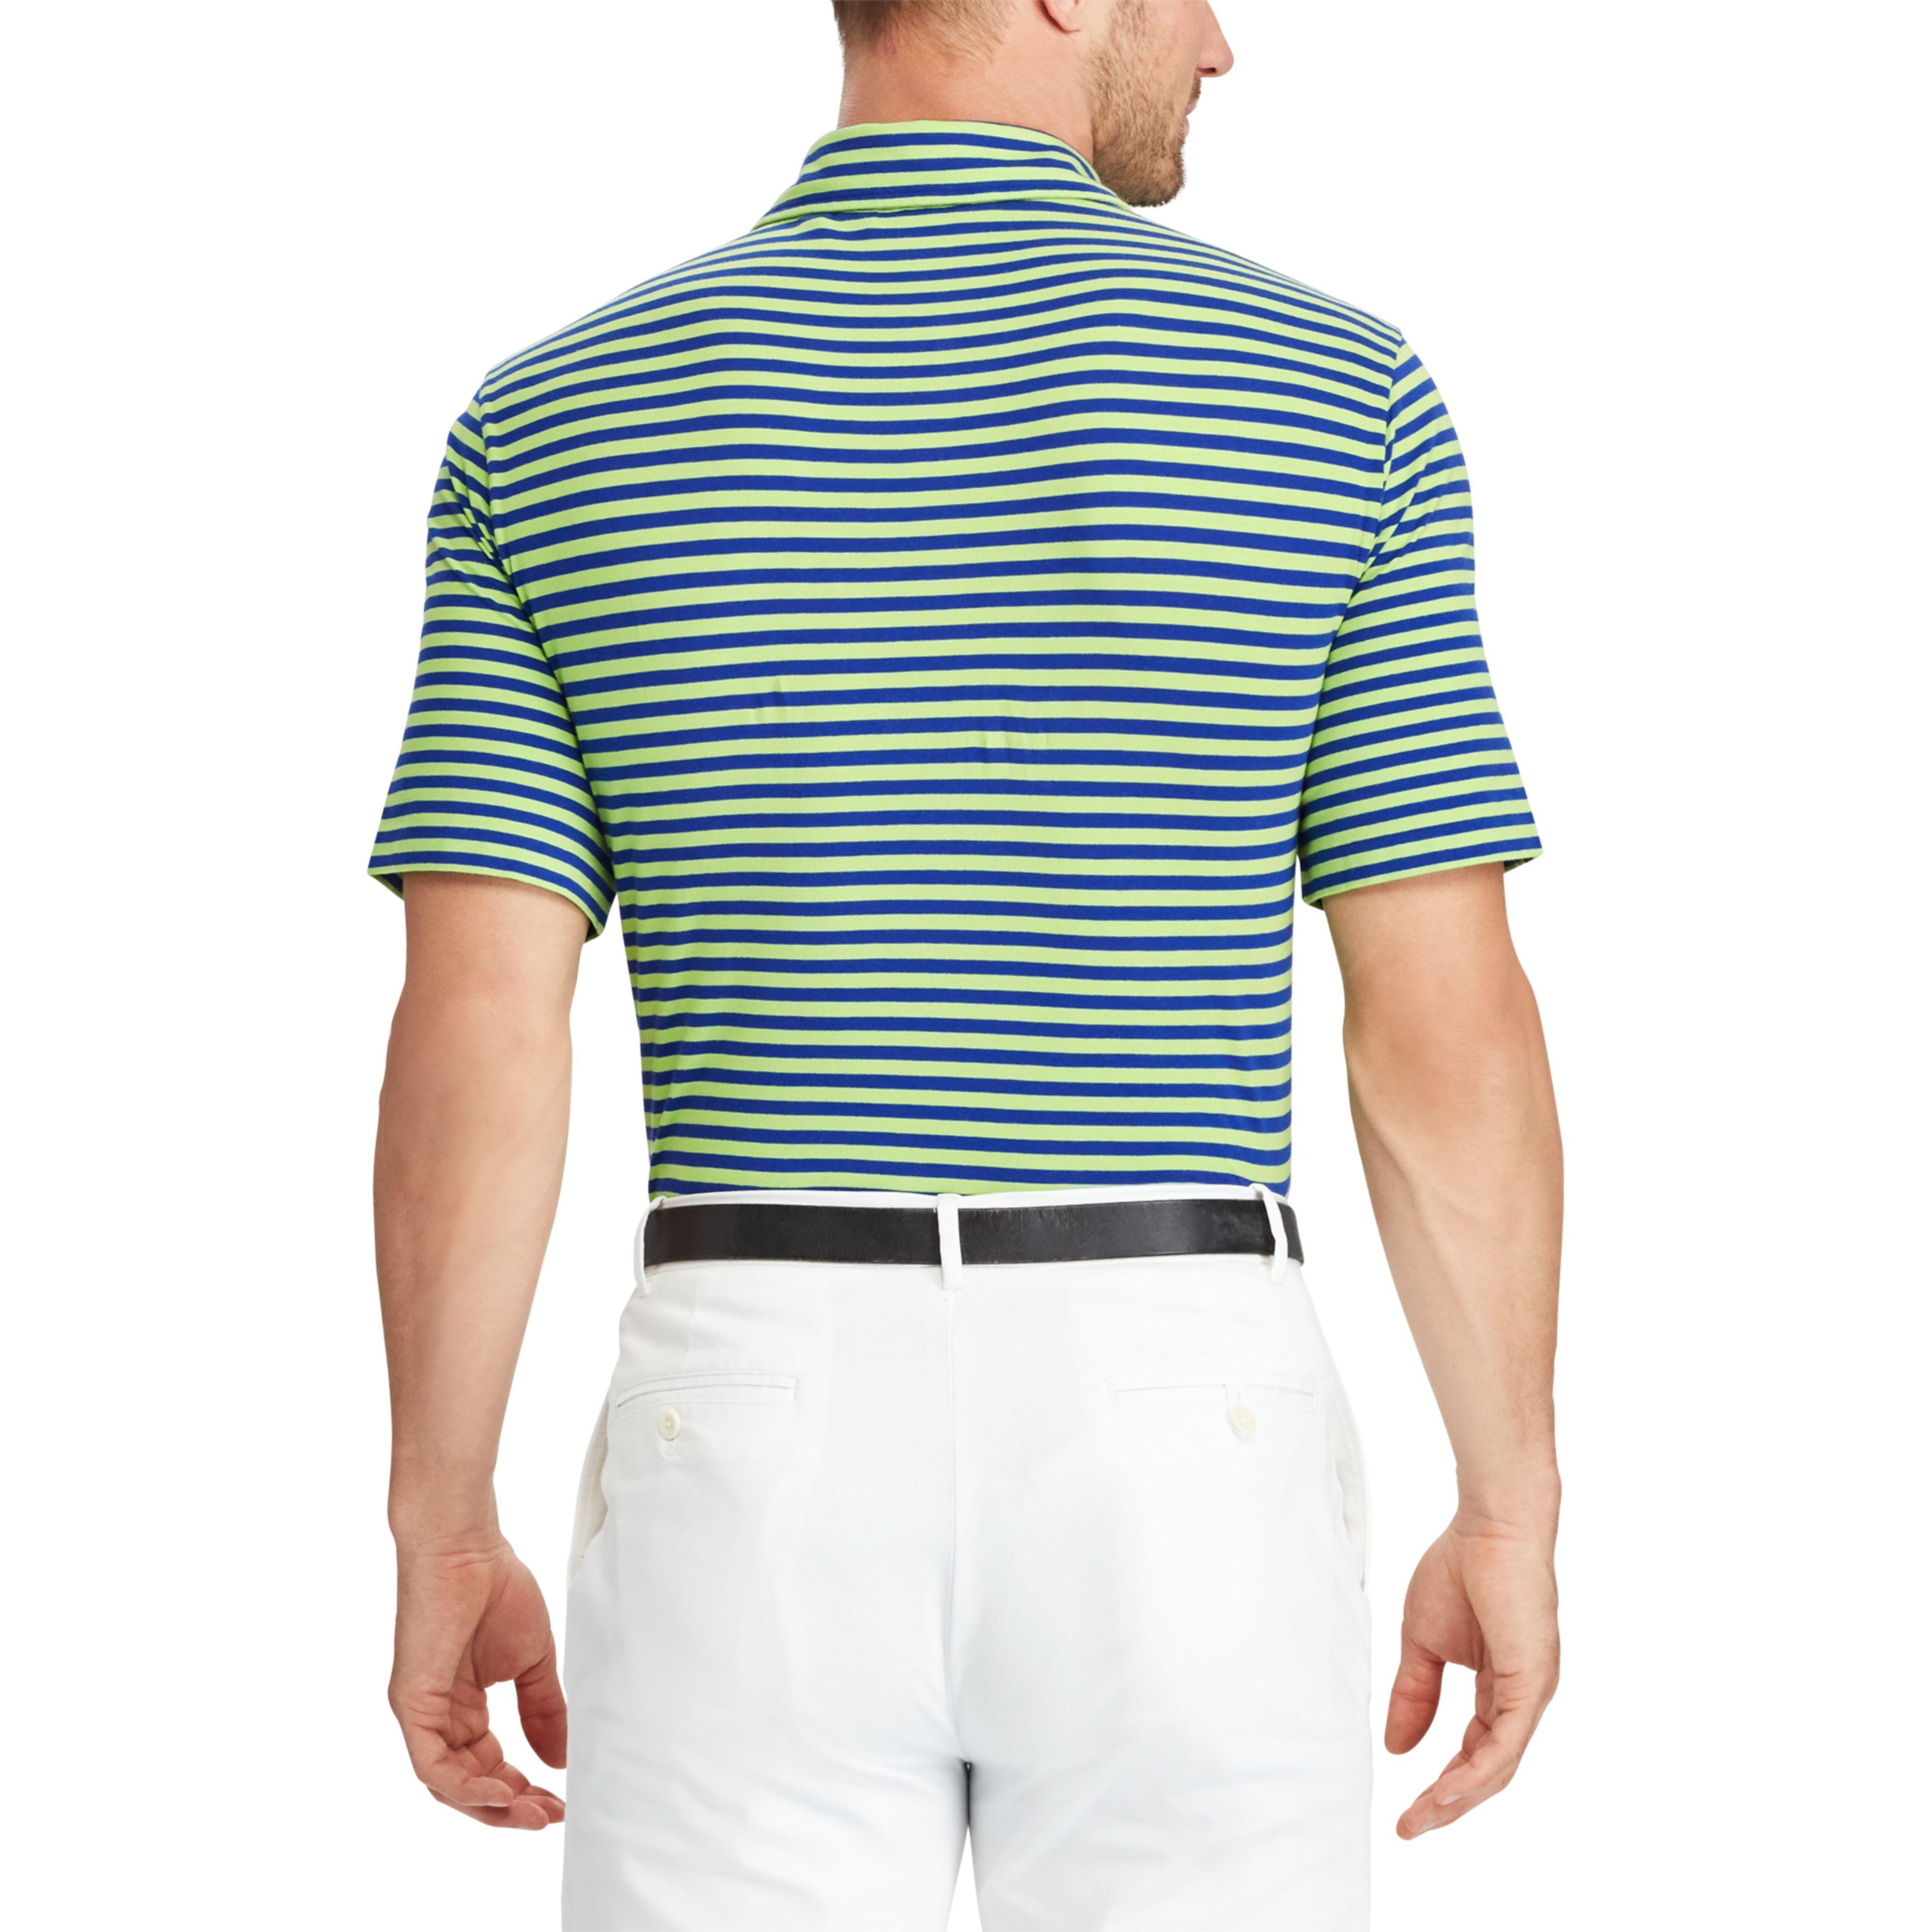 e5ef58813a Lyst - Ralph Lauren Custom Fit Stretch Lisle Polo in Blue for Men